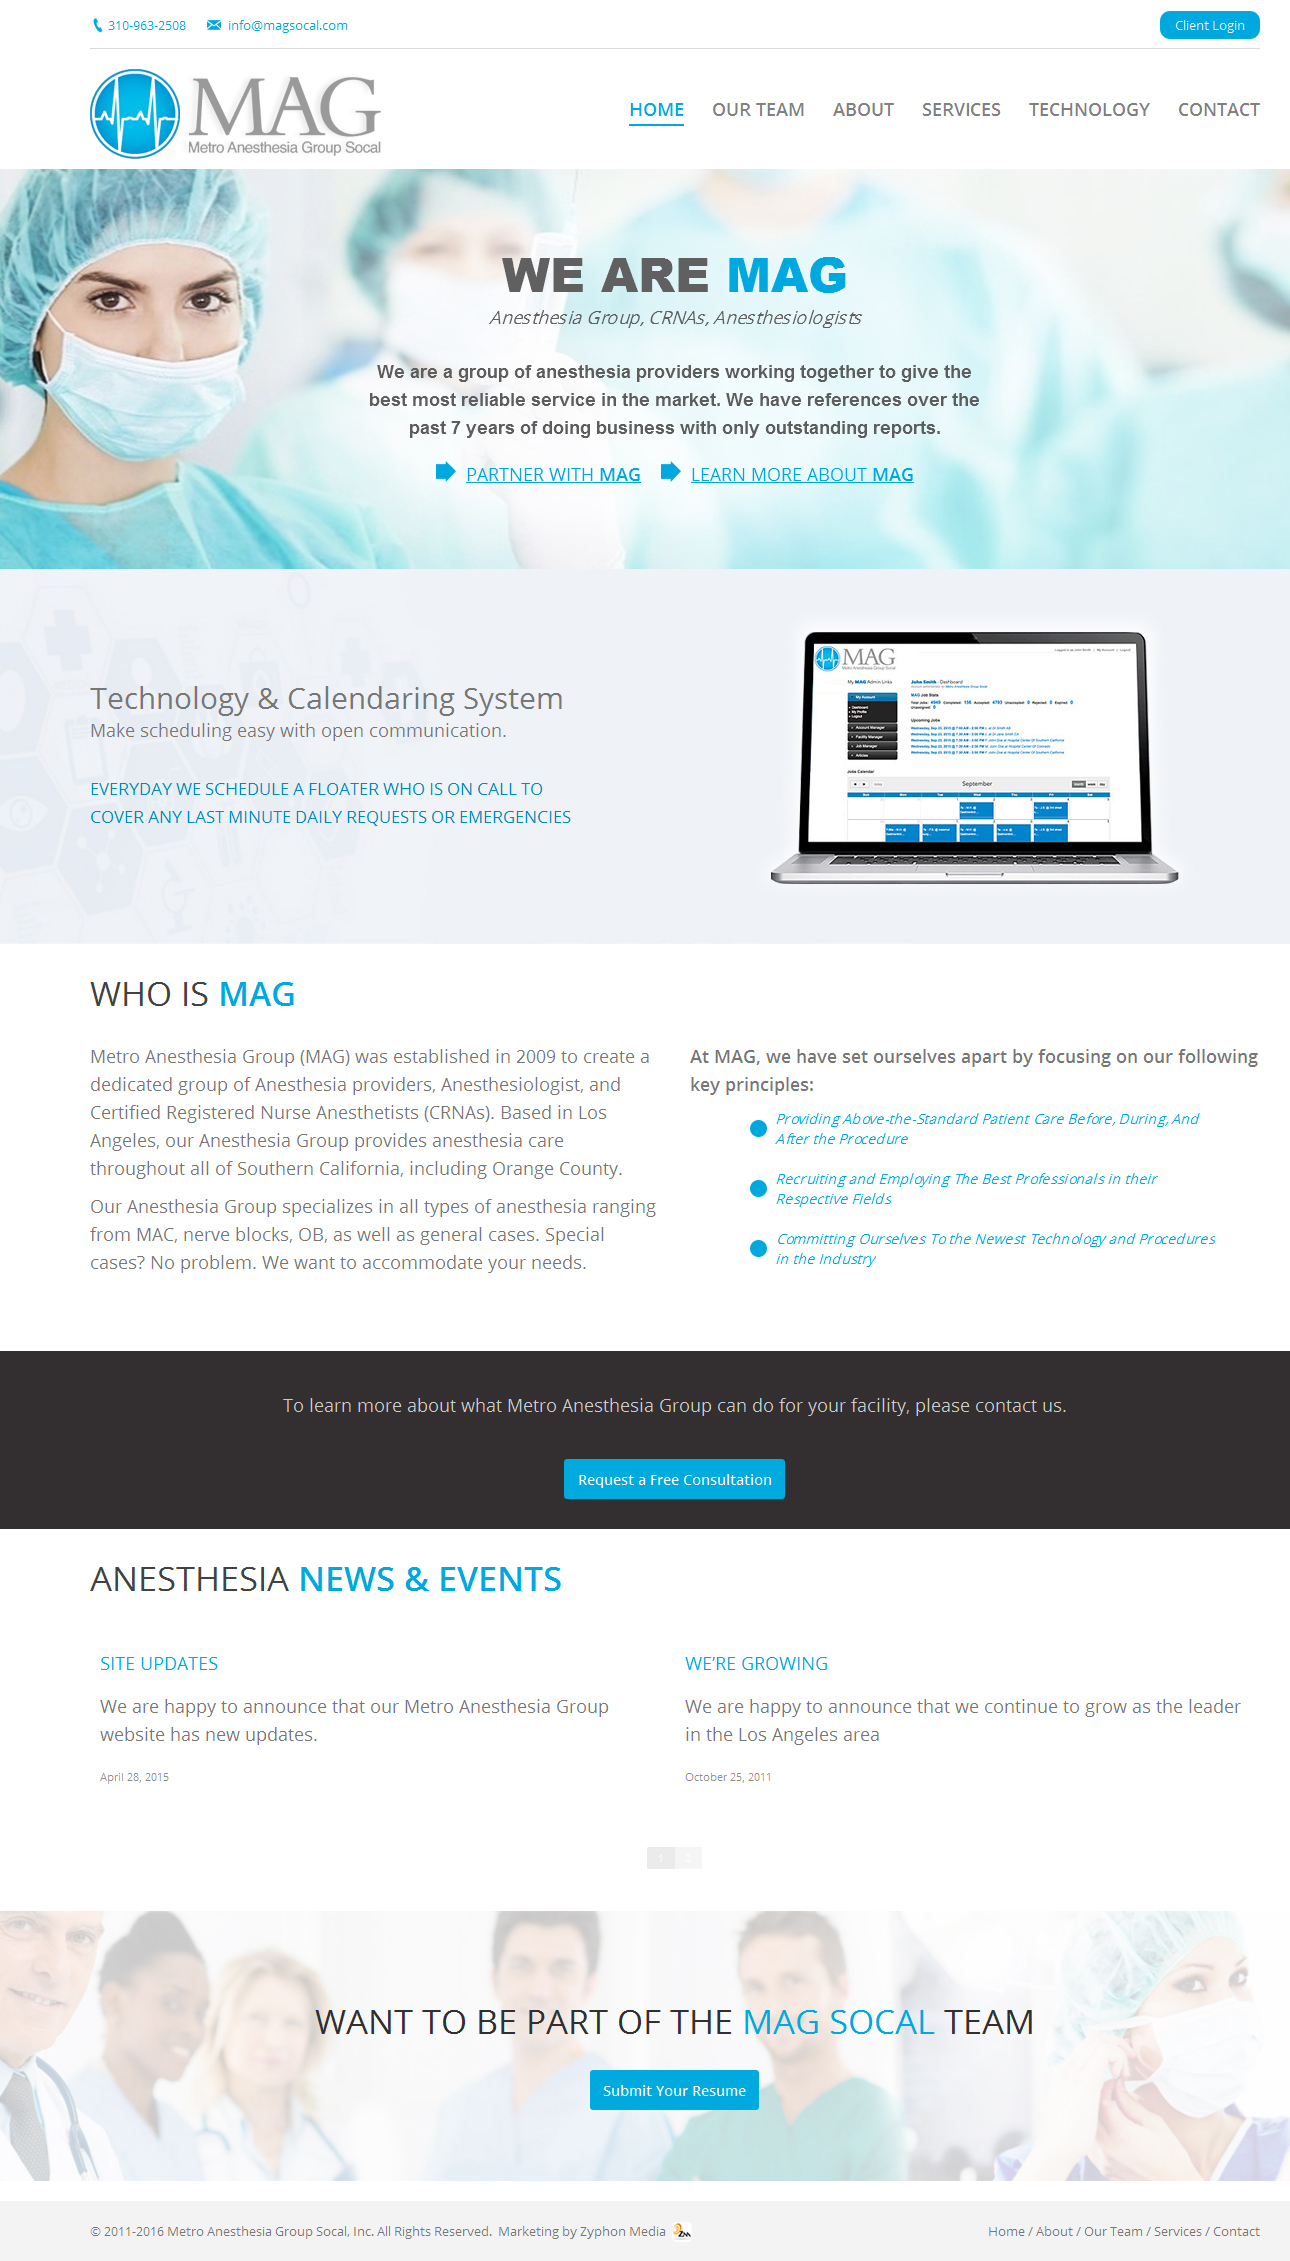 Marketing for Metro Anesthesia Group (MAG)